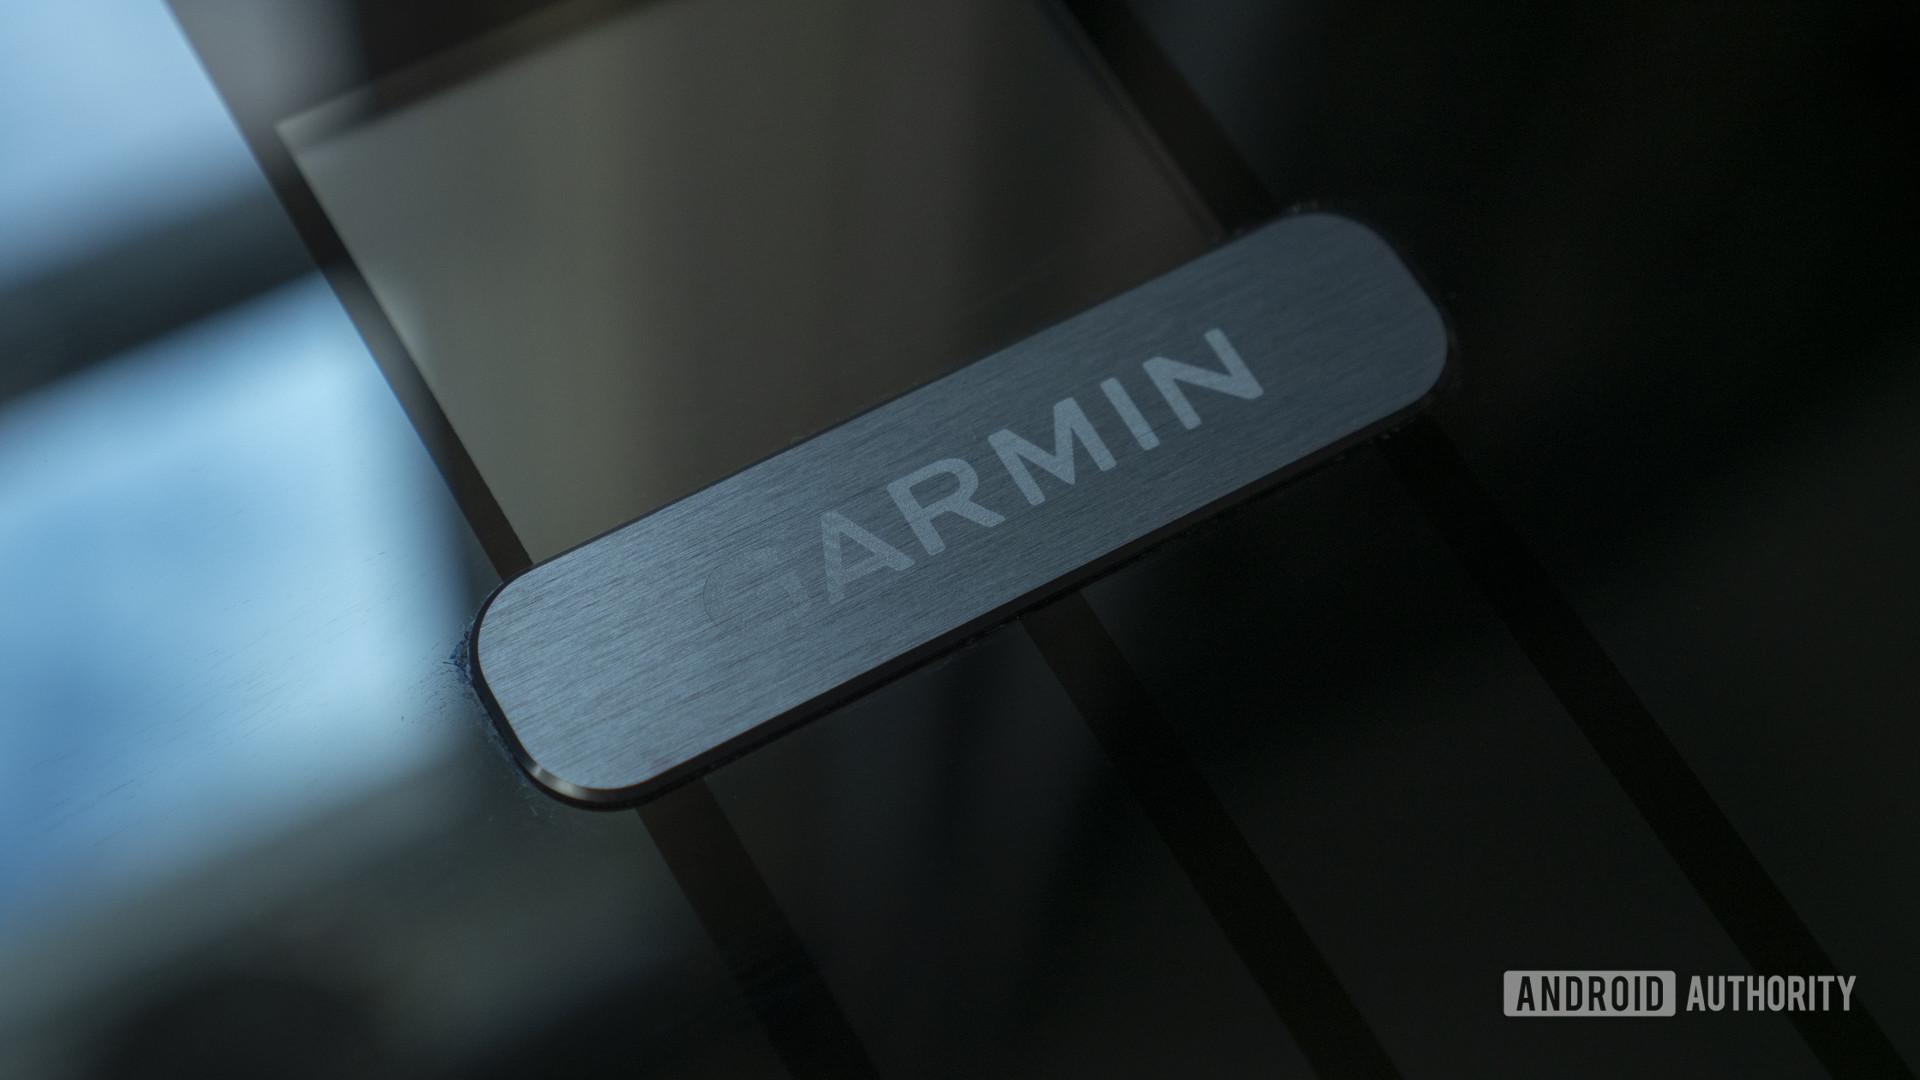 garmin index s2 smart scale review garmin logo